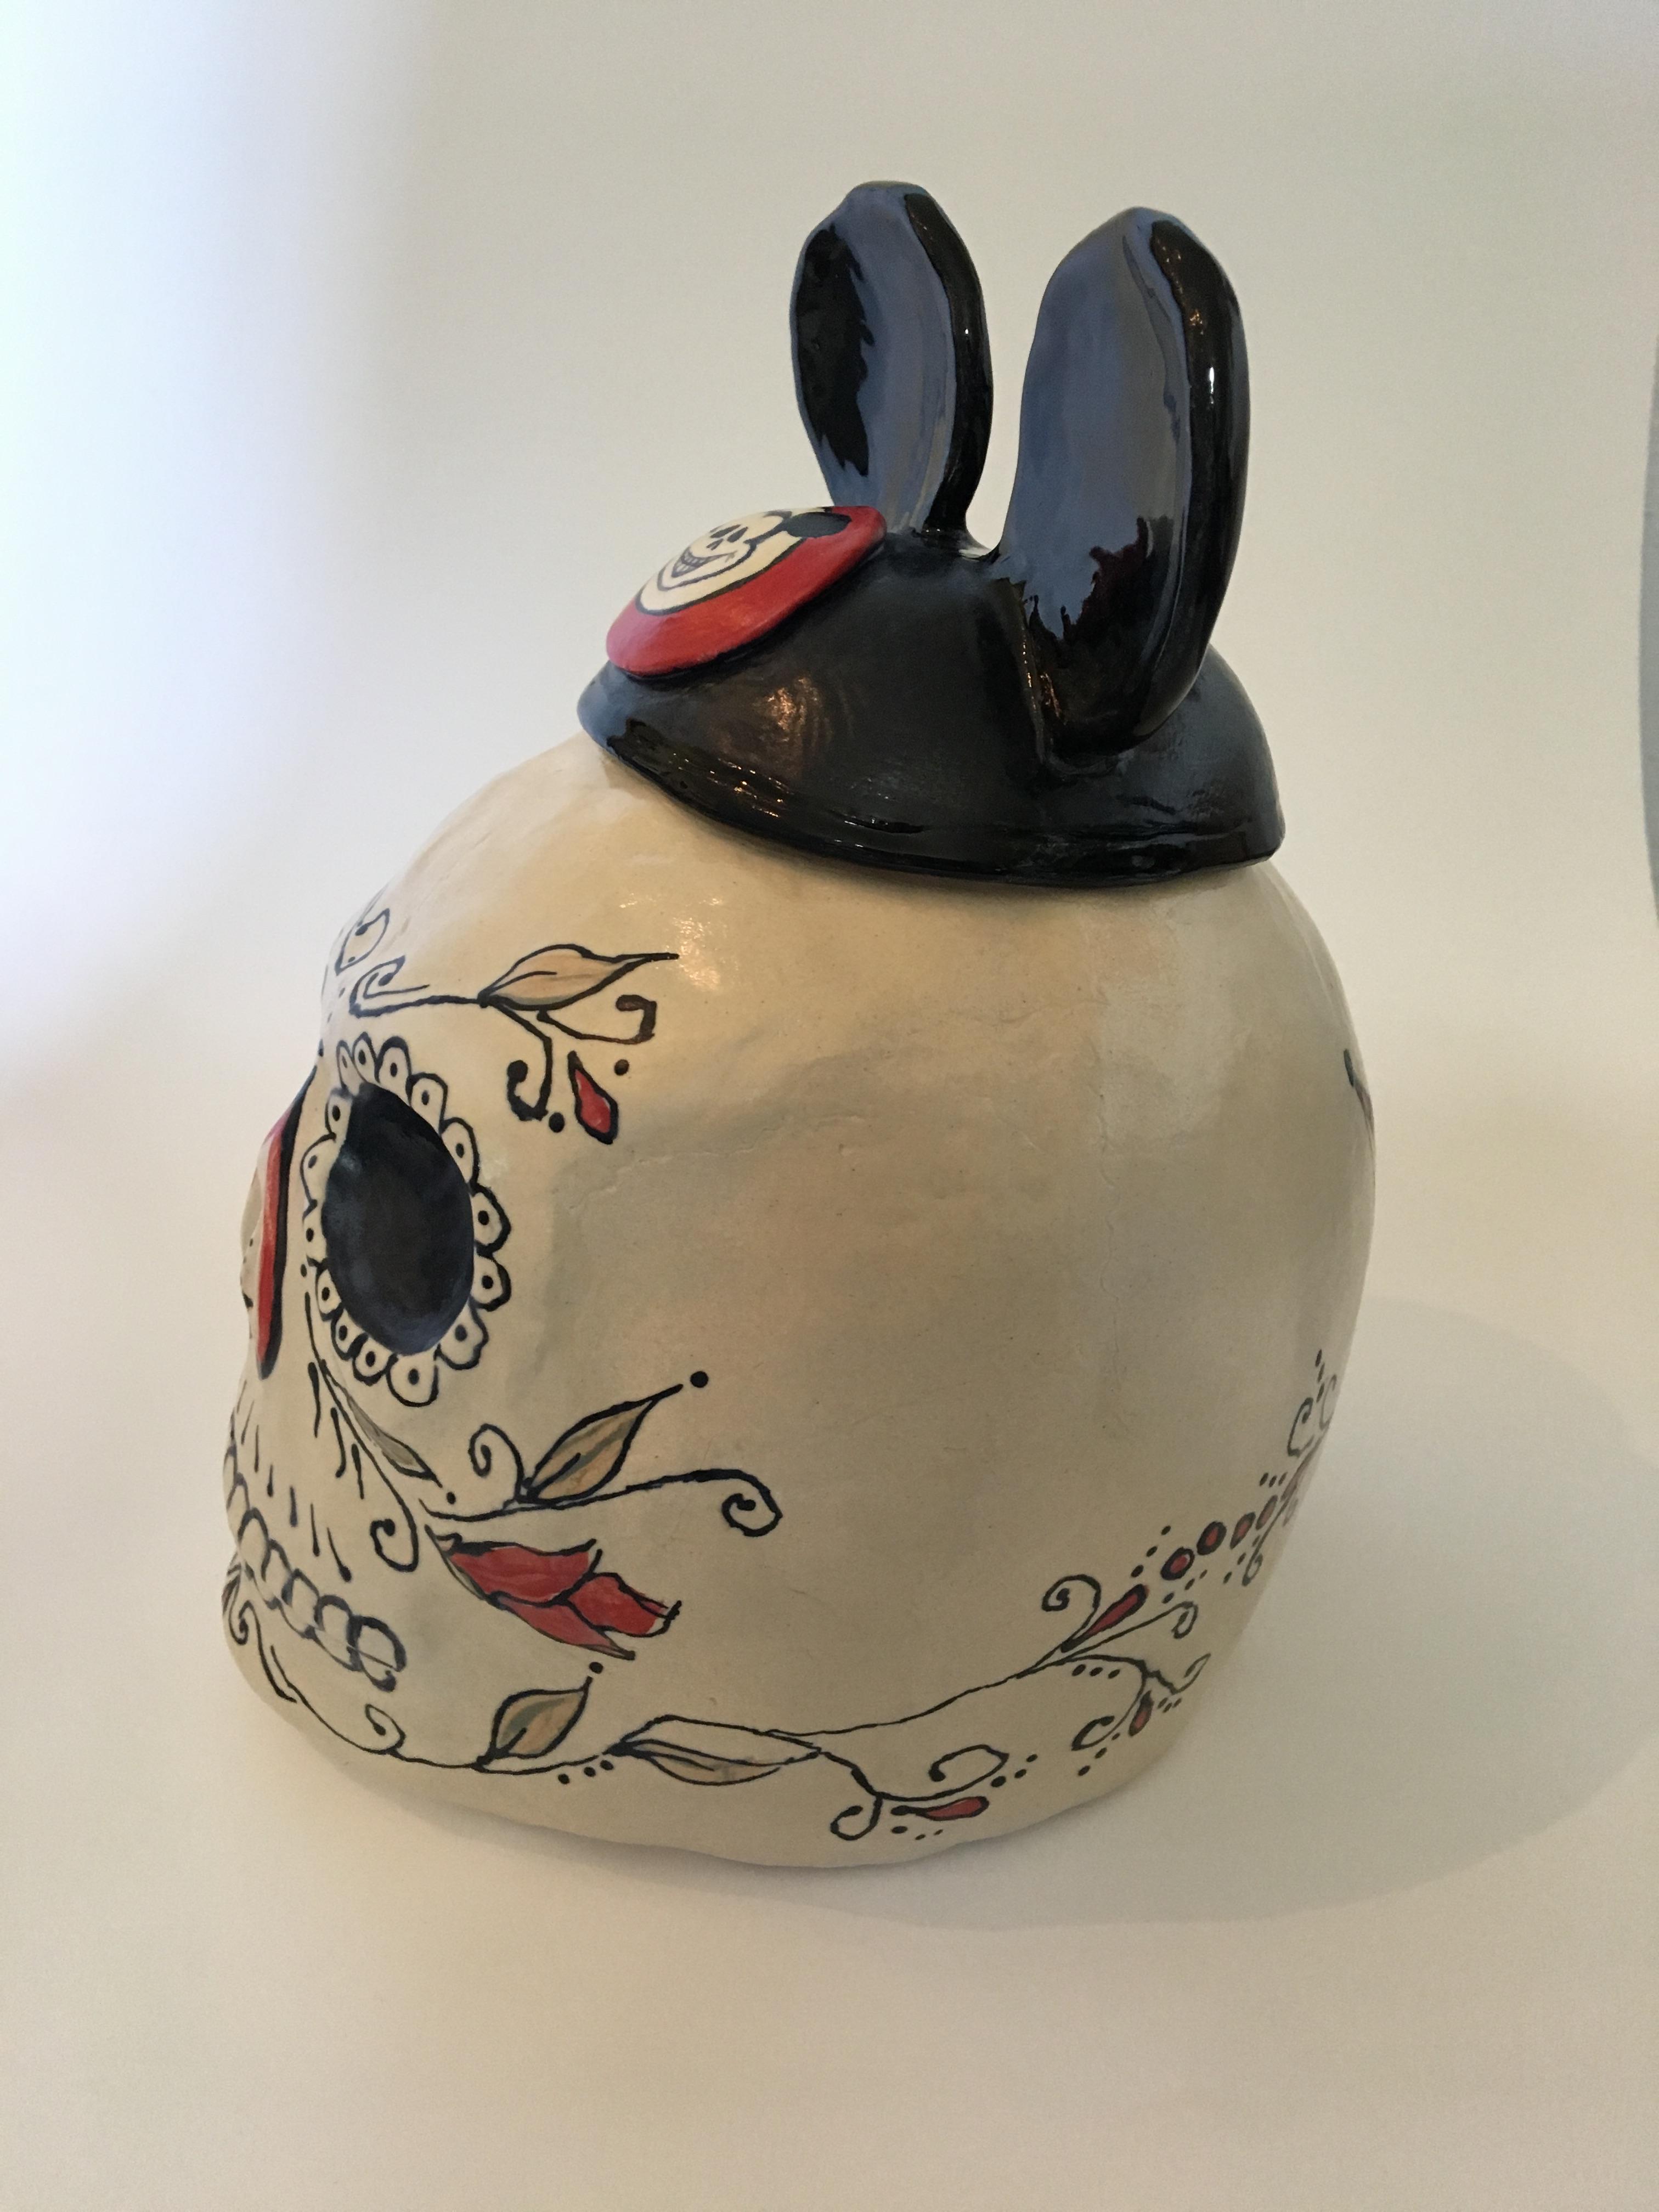 Mickey Skull cookie jar #3